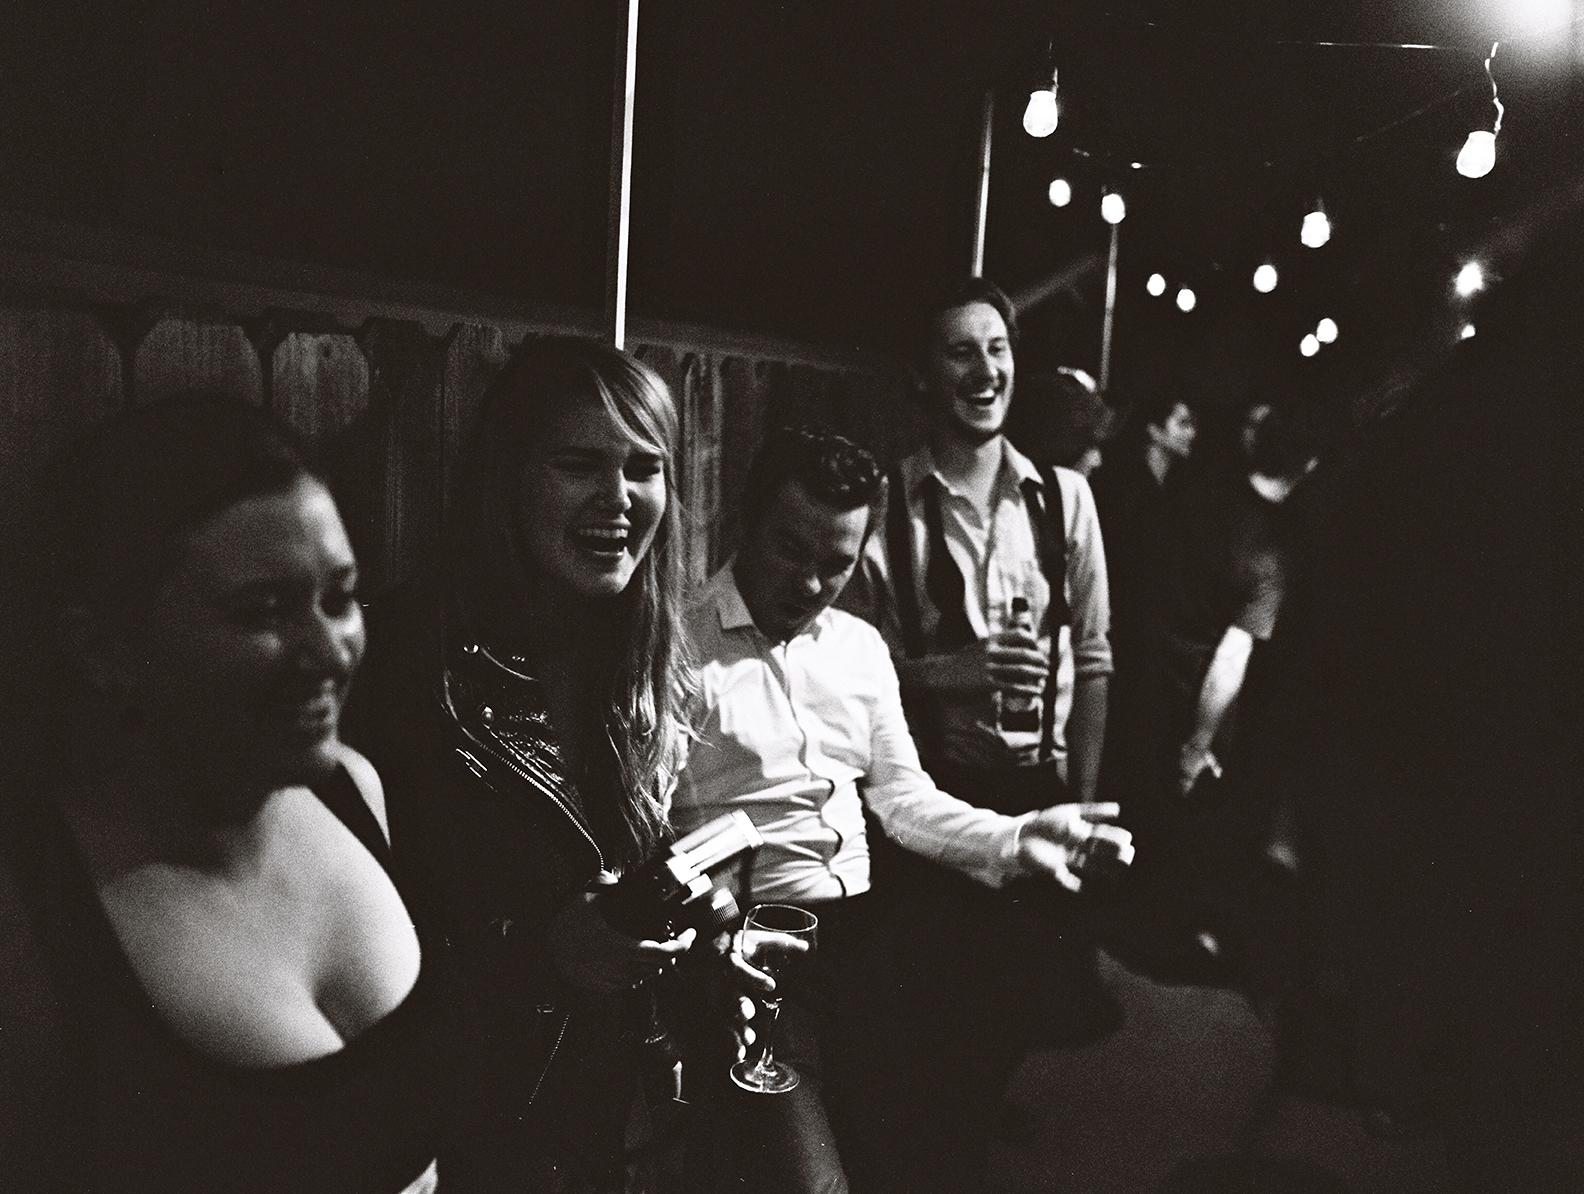 357-brian-sarra-los-angeles-wedding-brumley-wells-photography.jpg